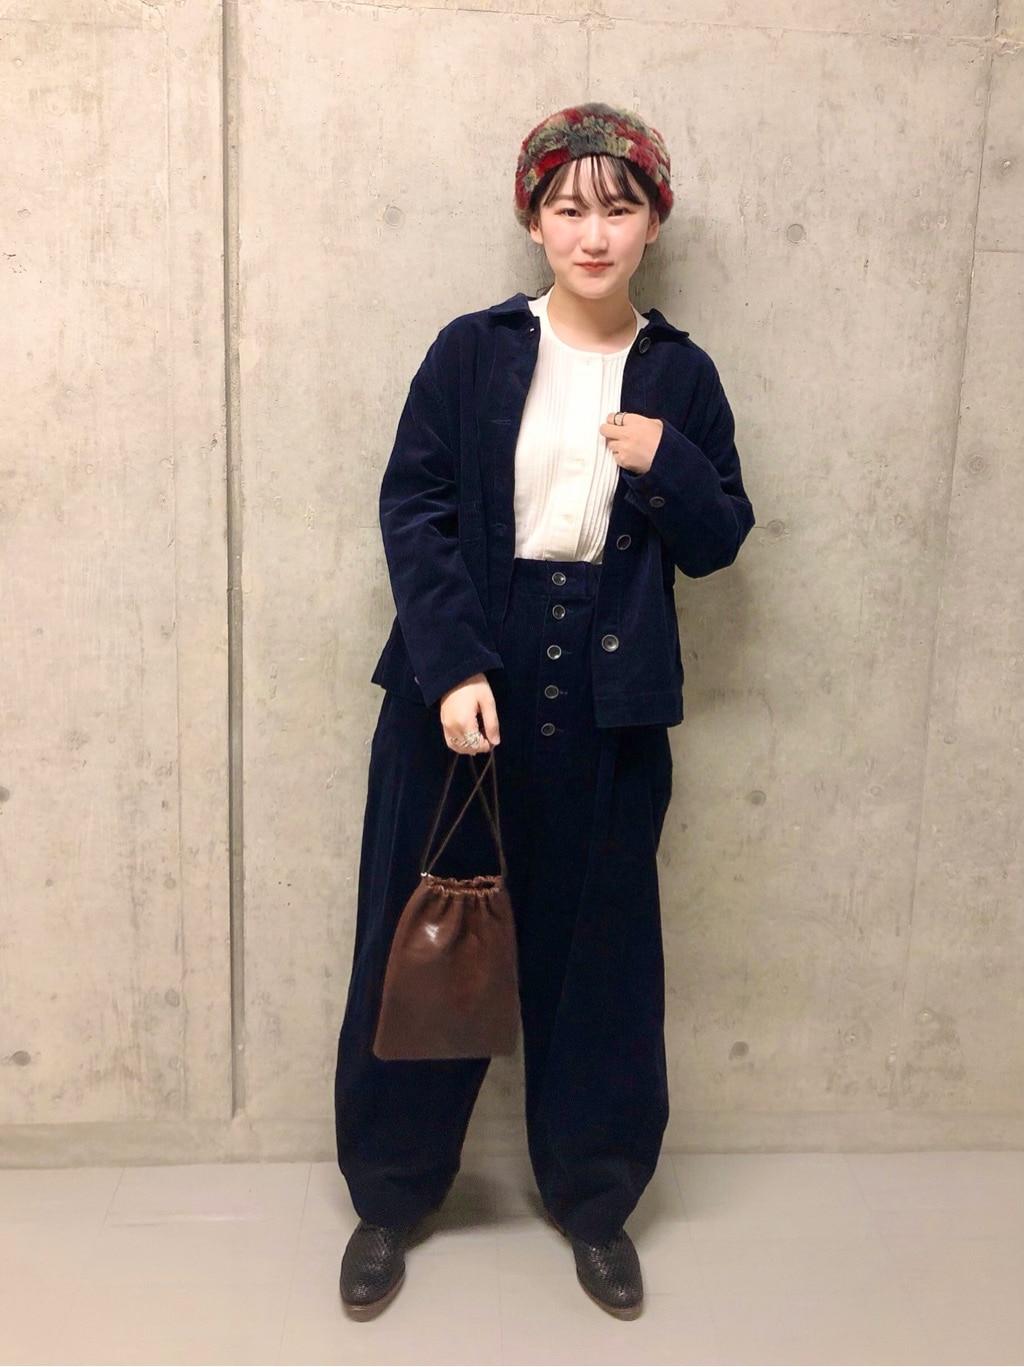 bulle de savon 阪急西宮ガーデンズ 身長:166cm 2020.10.09